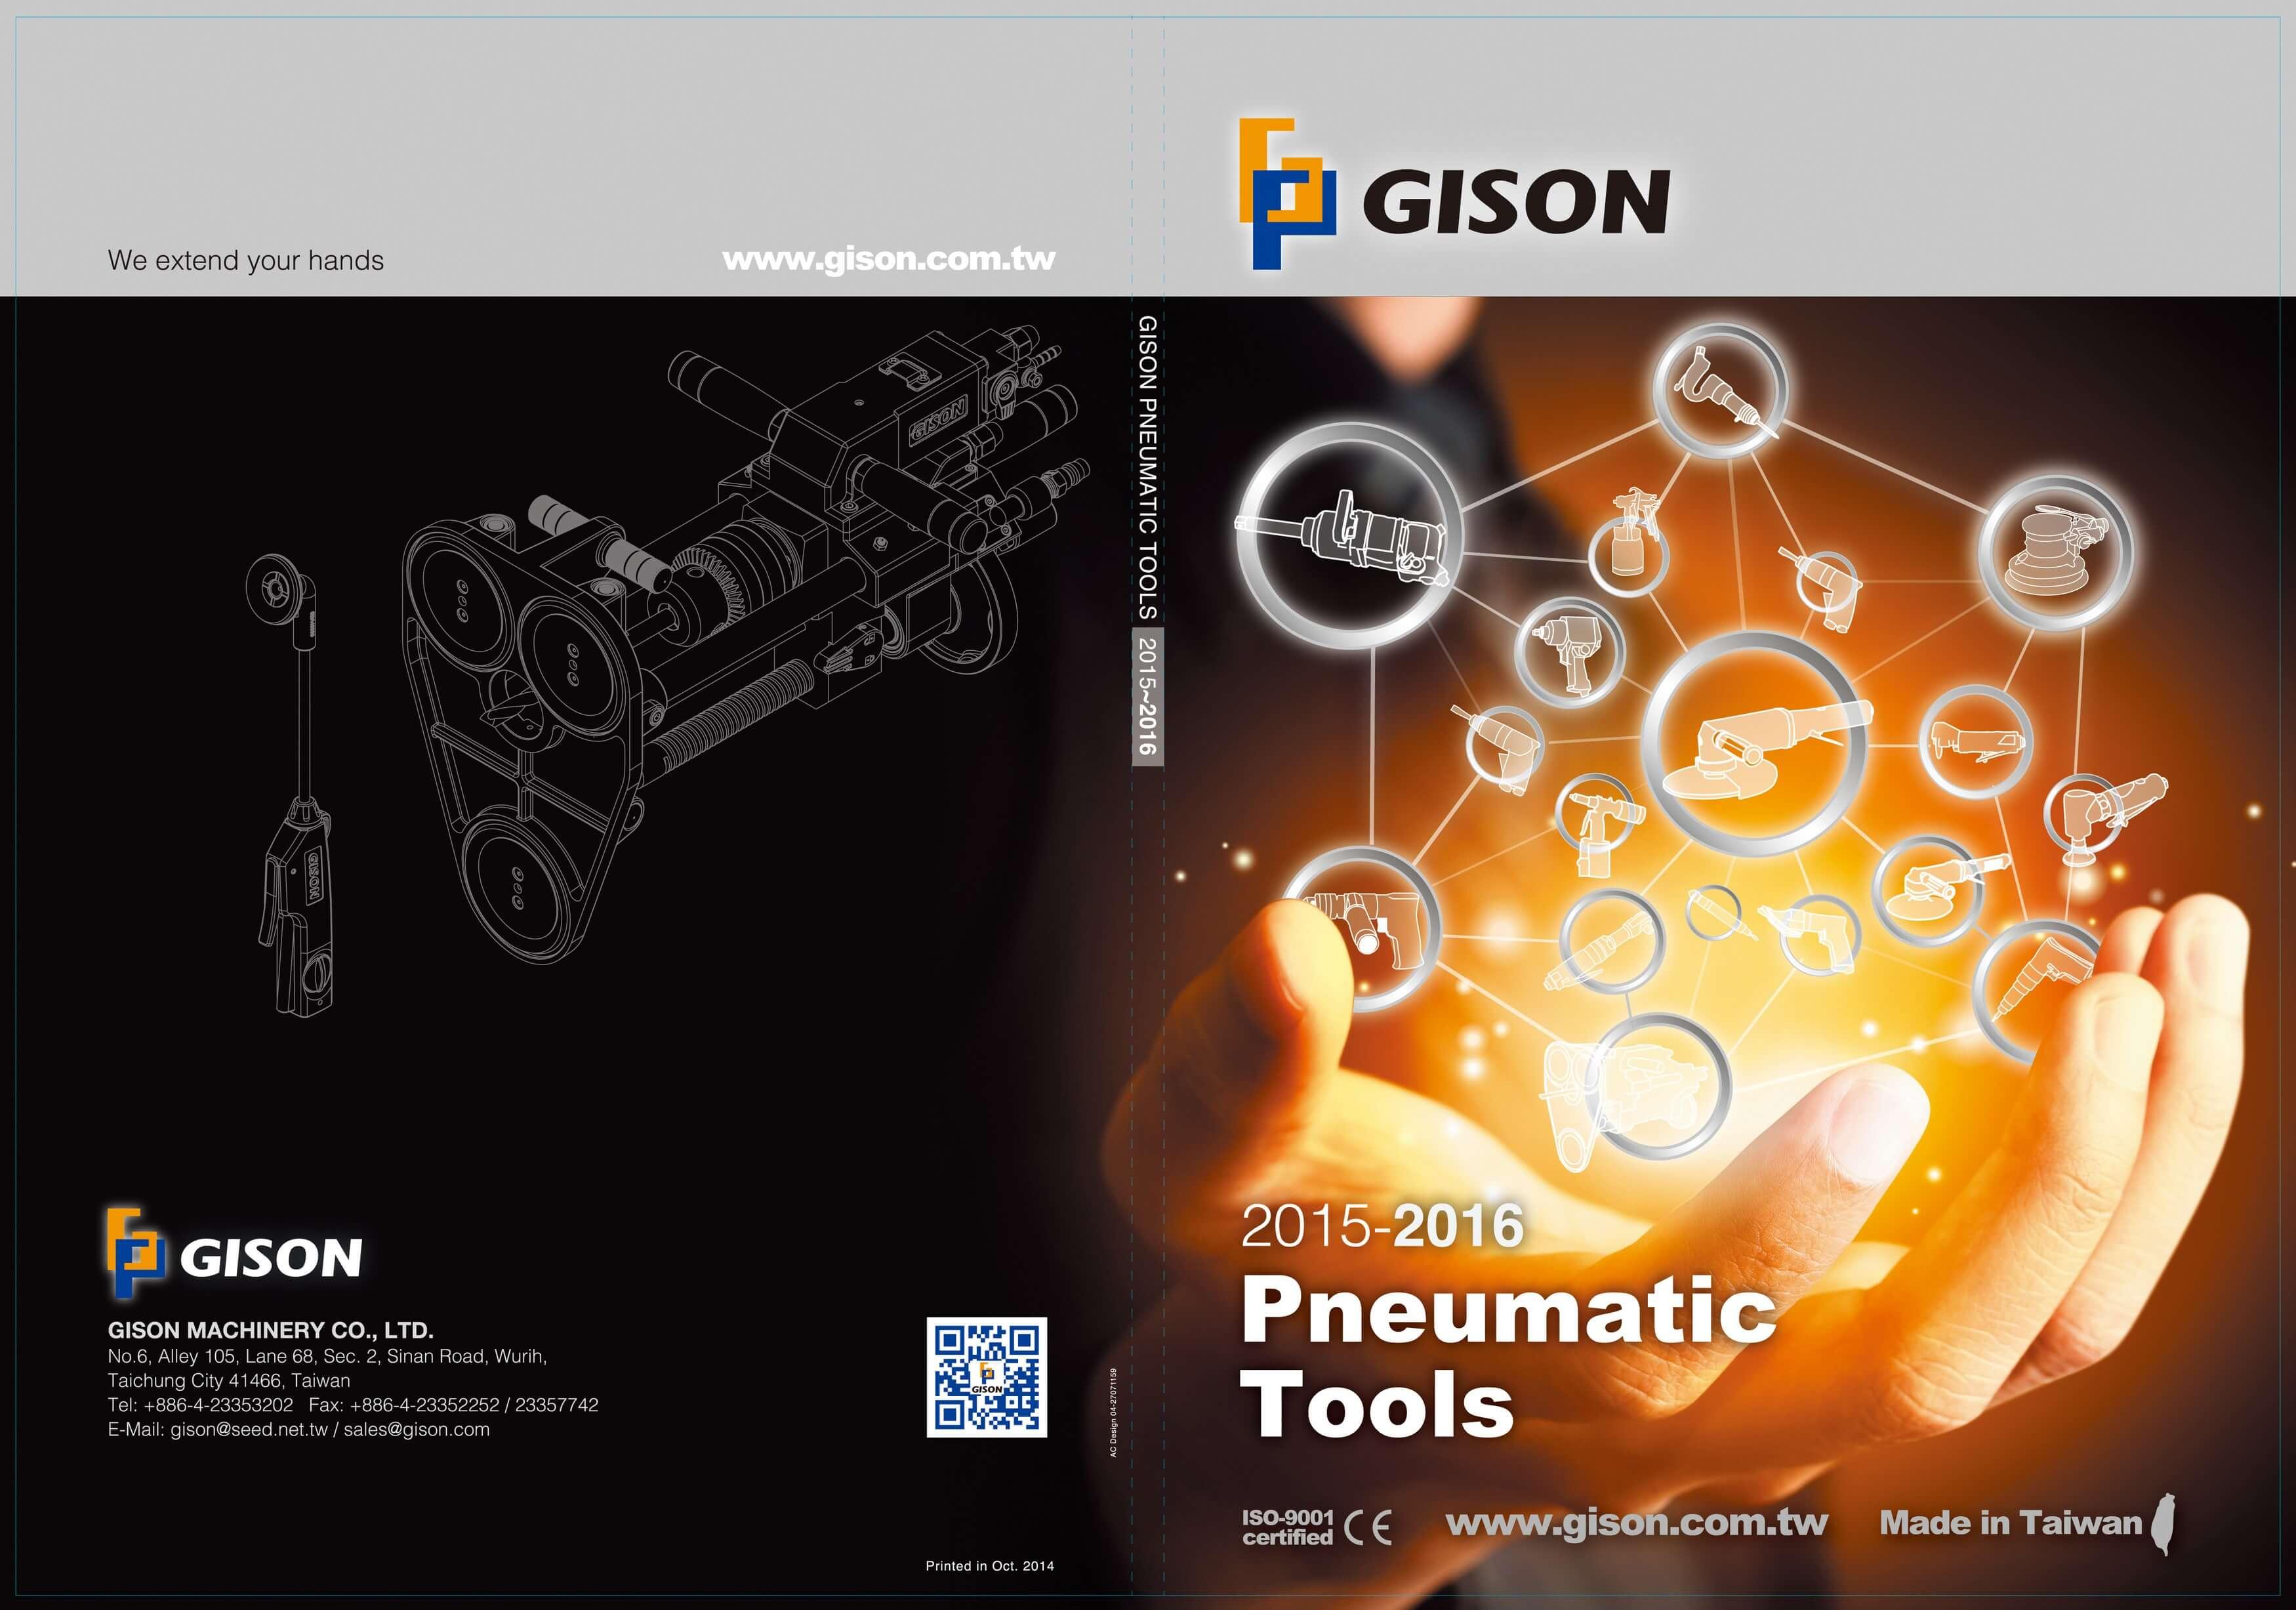 2015-2016 GISON Air Tools, Pneumatic Tools Catalog | GISON MACHINERY